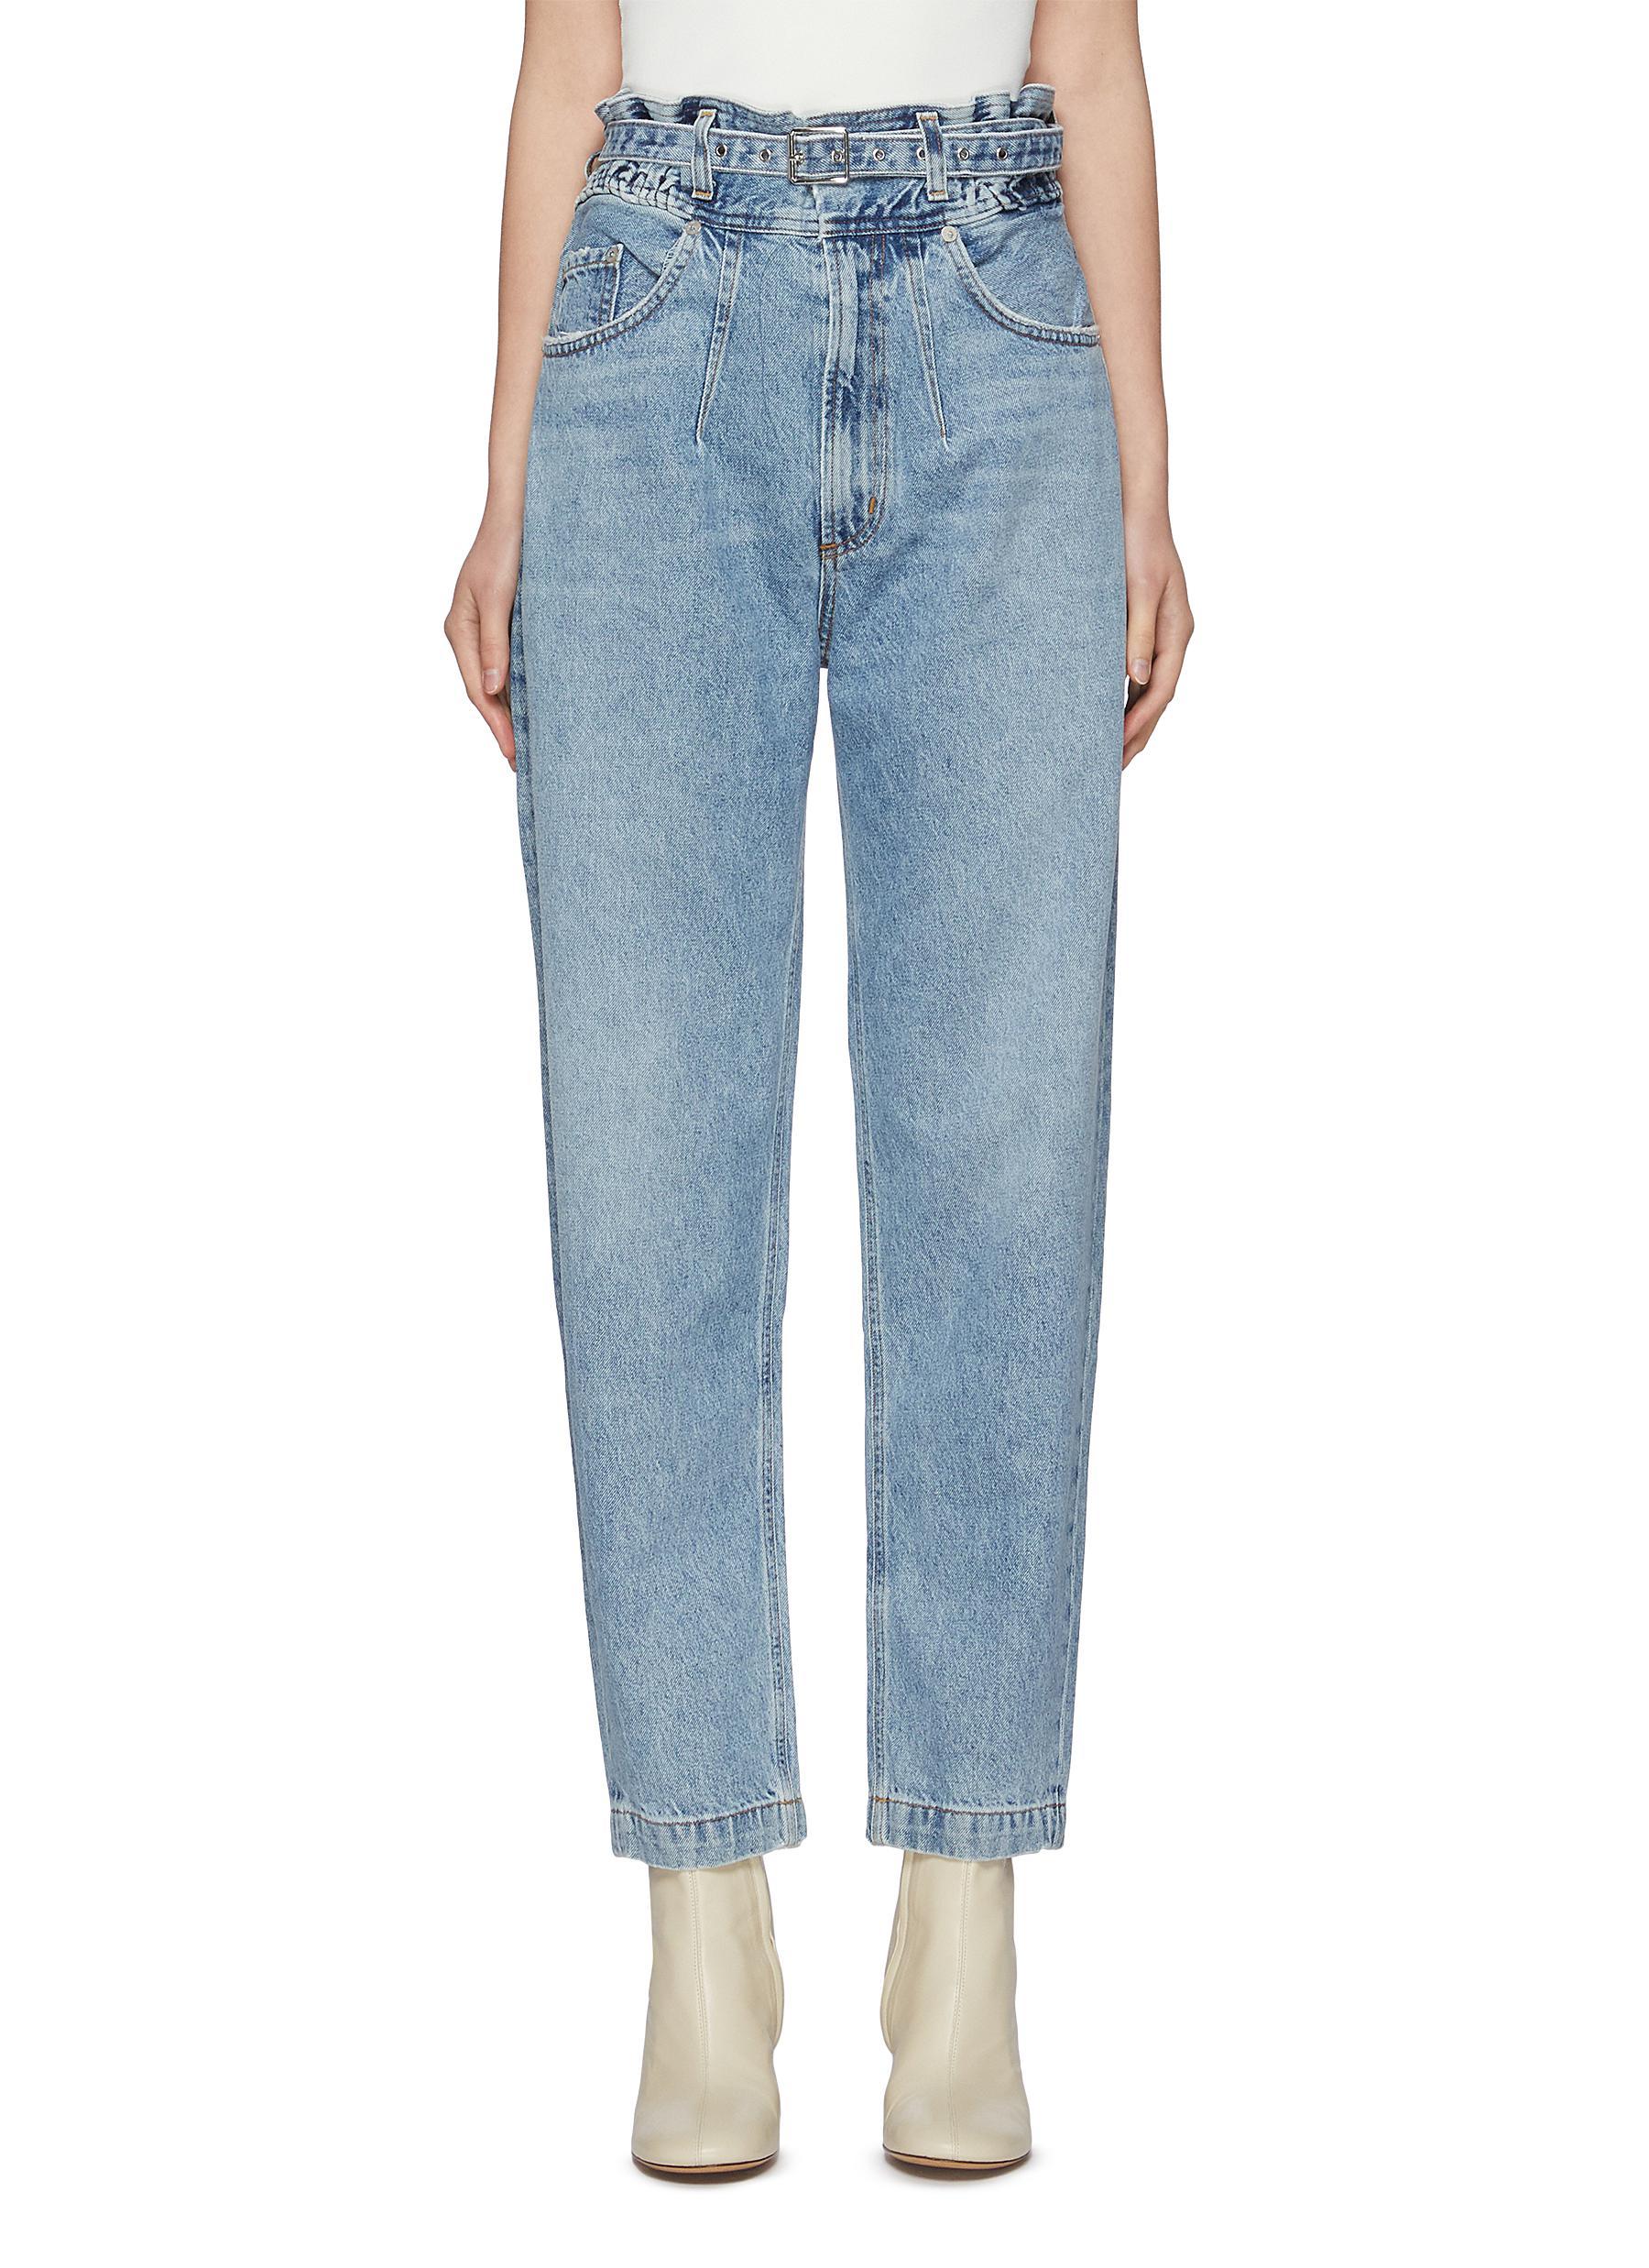 'Riya' Belted Taper Leg Jeans